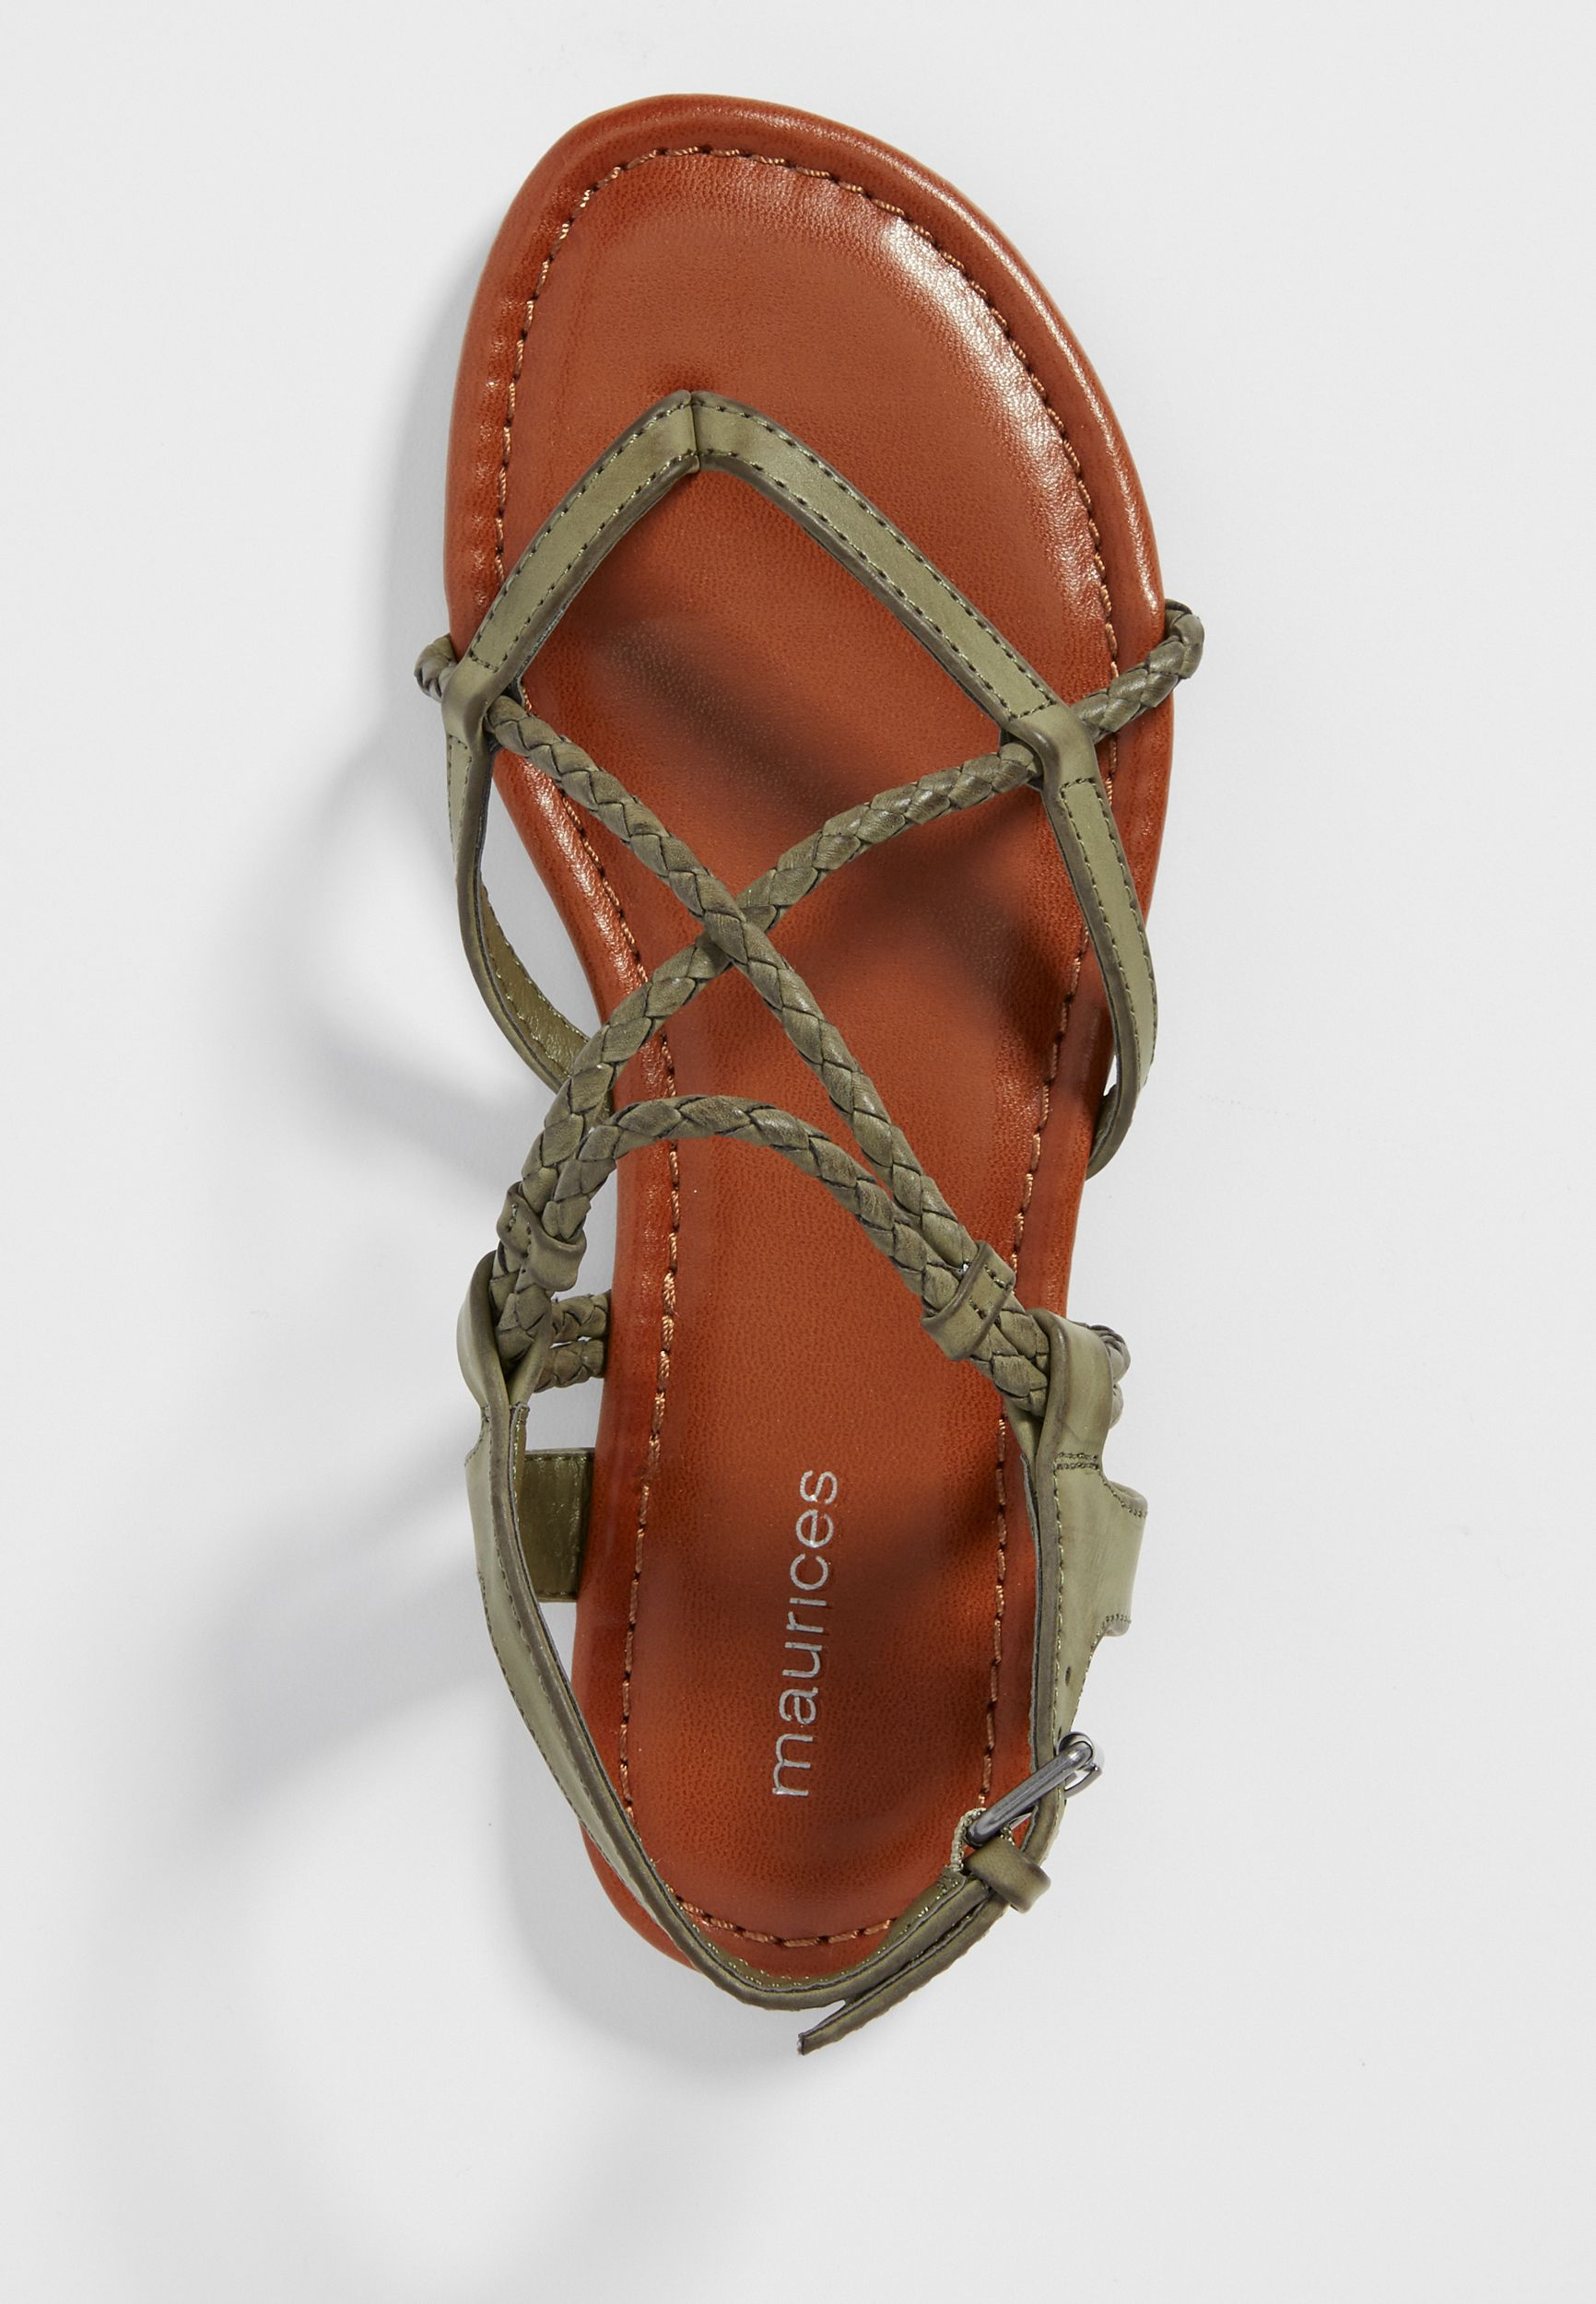 47d48ebd8f0 Adalie braided strap sandal (original price